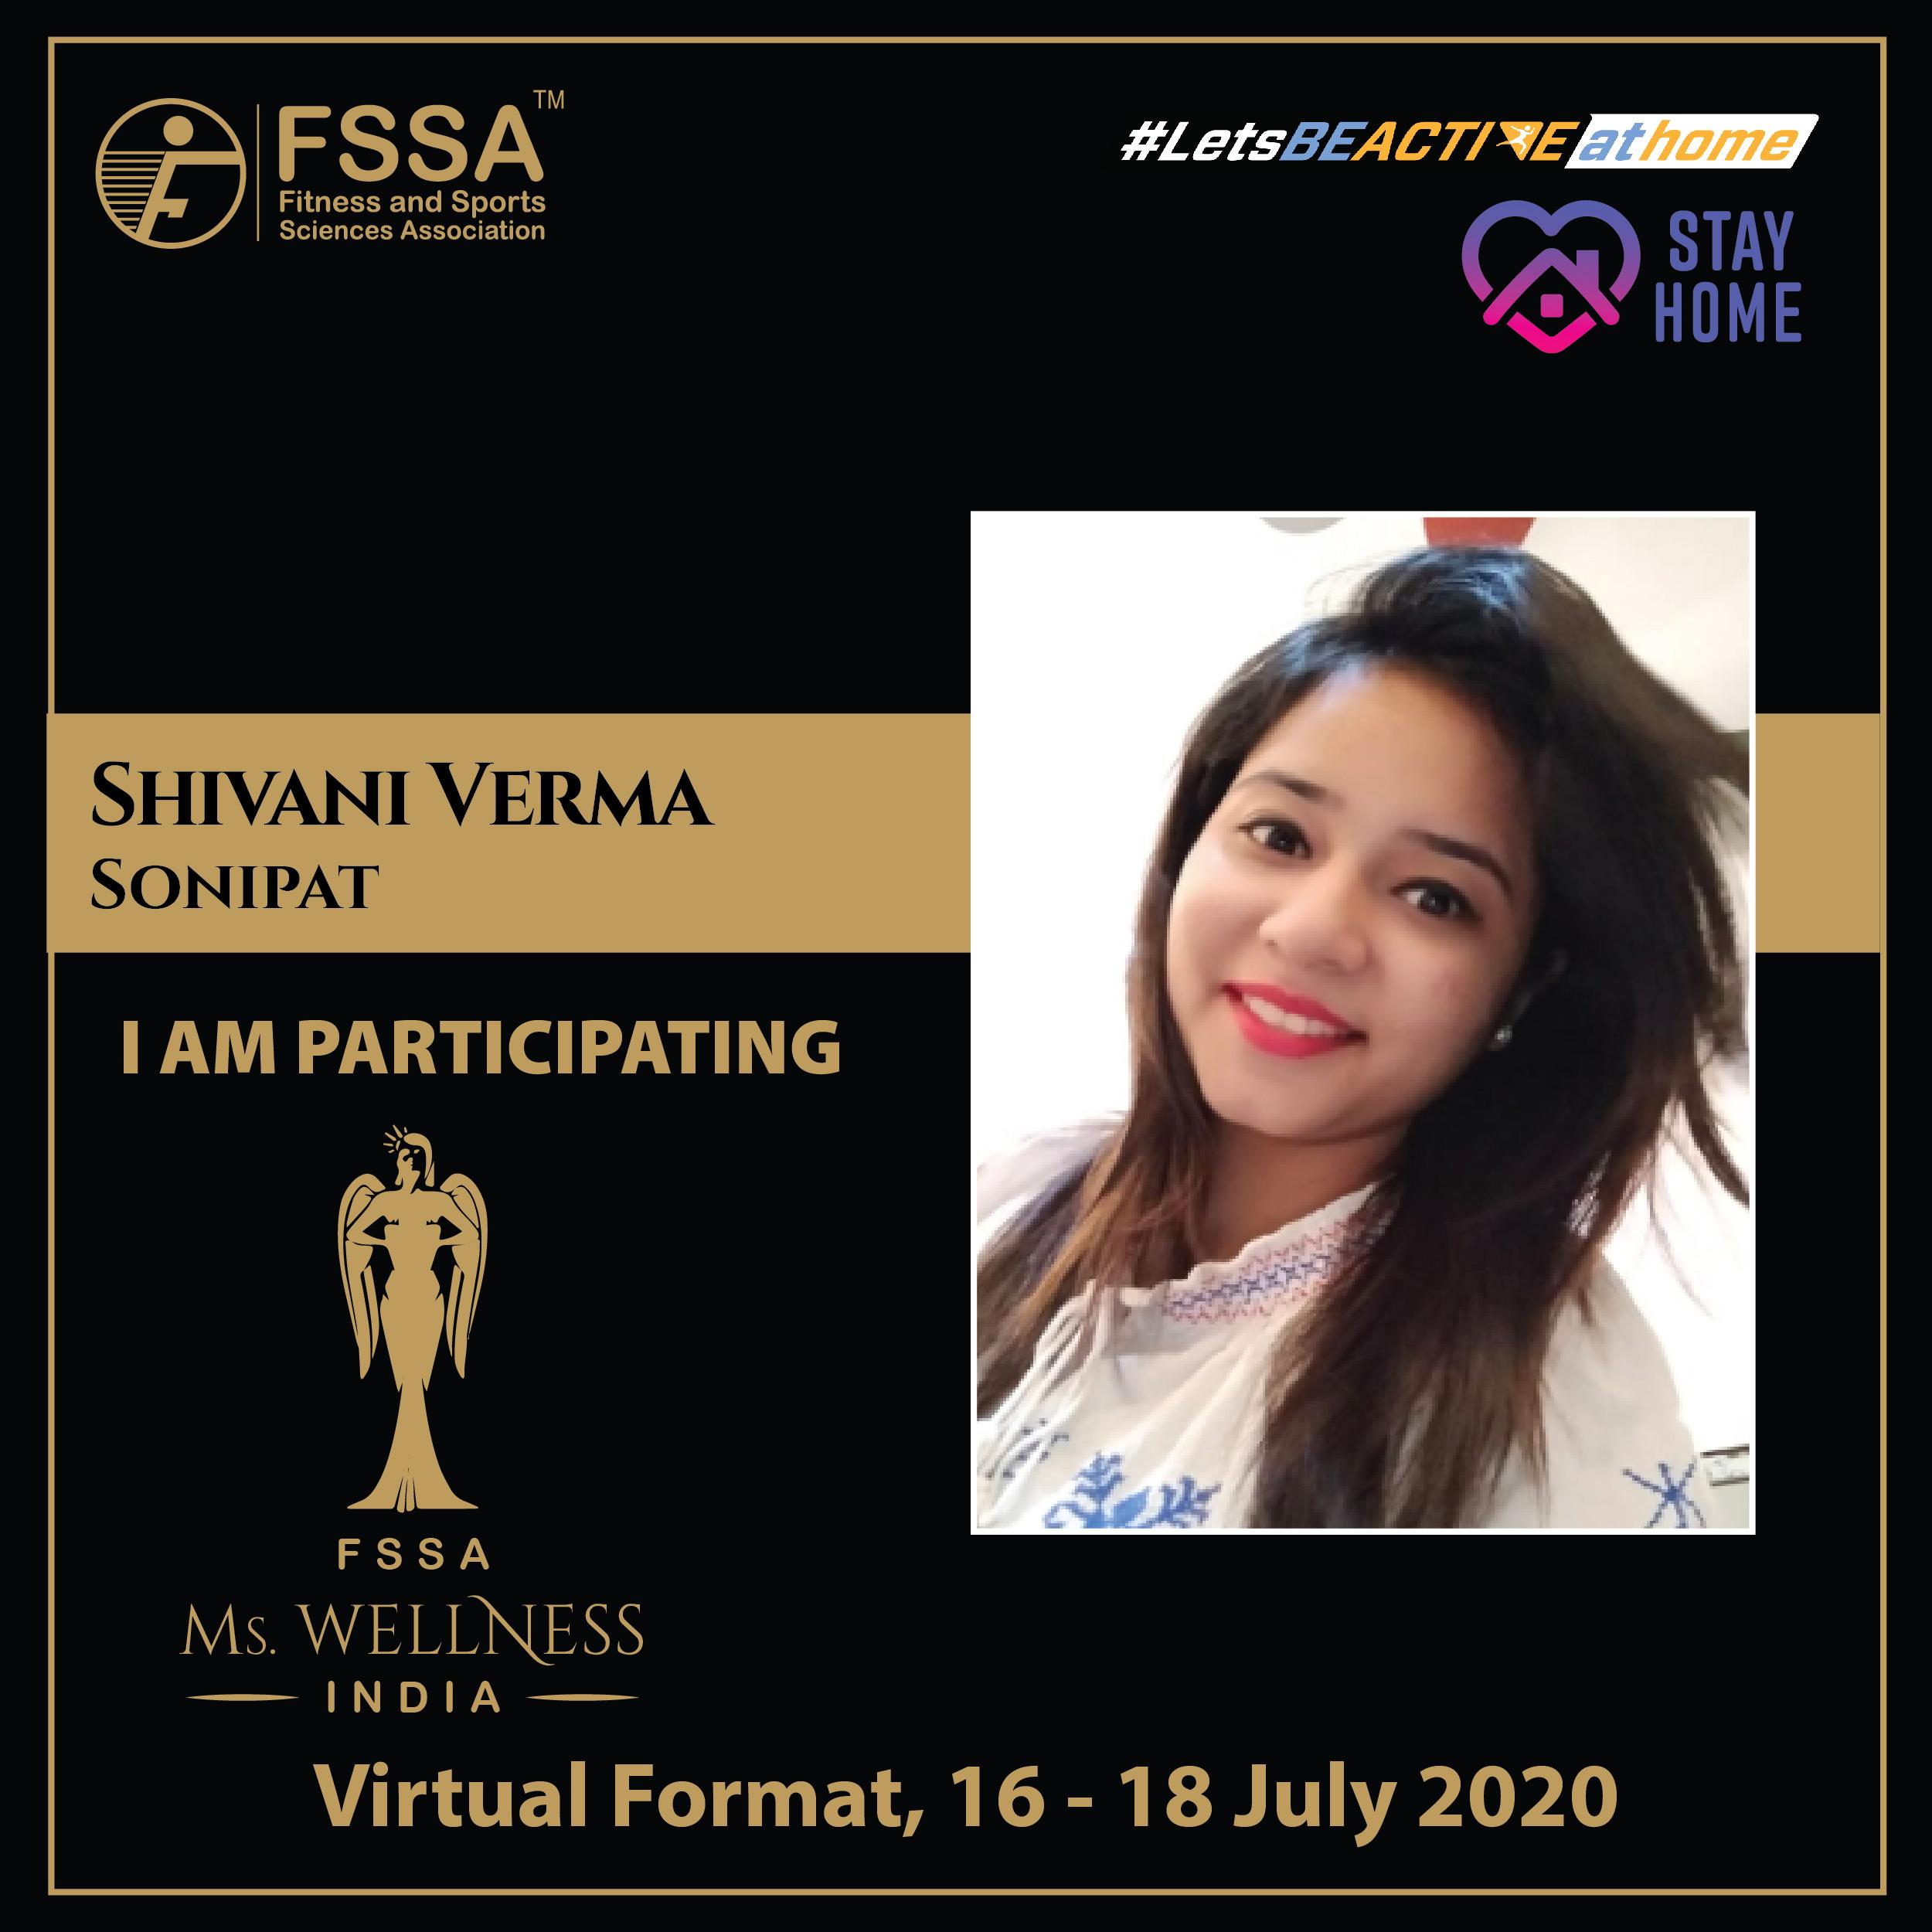 22-Shivani-Verma